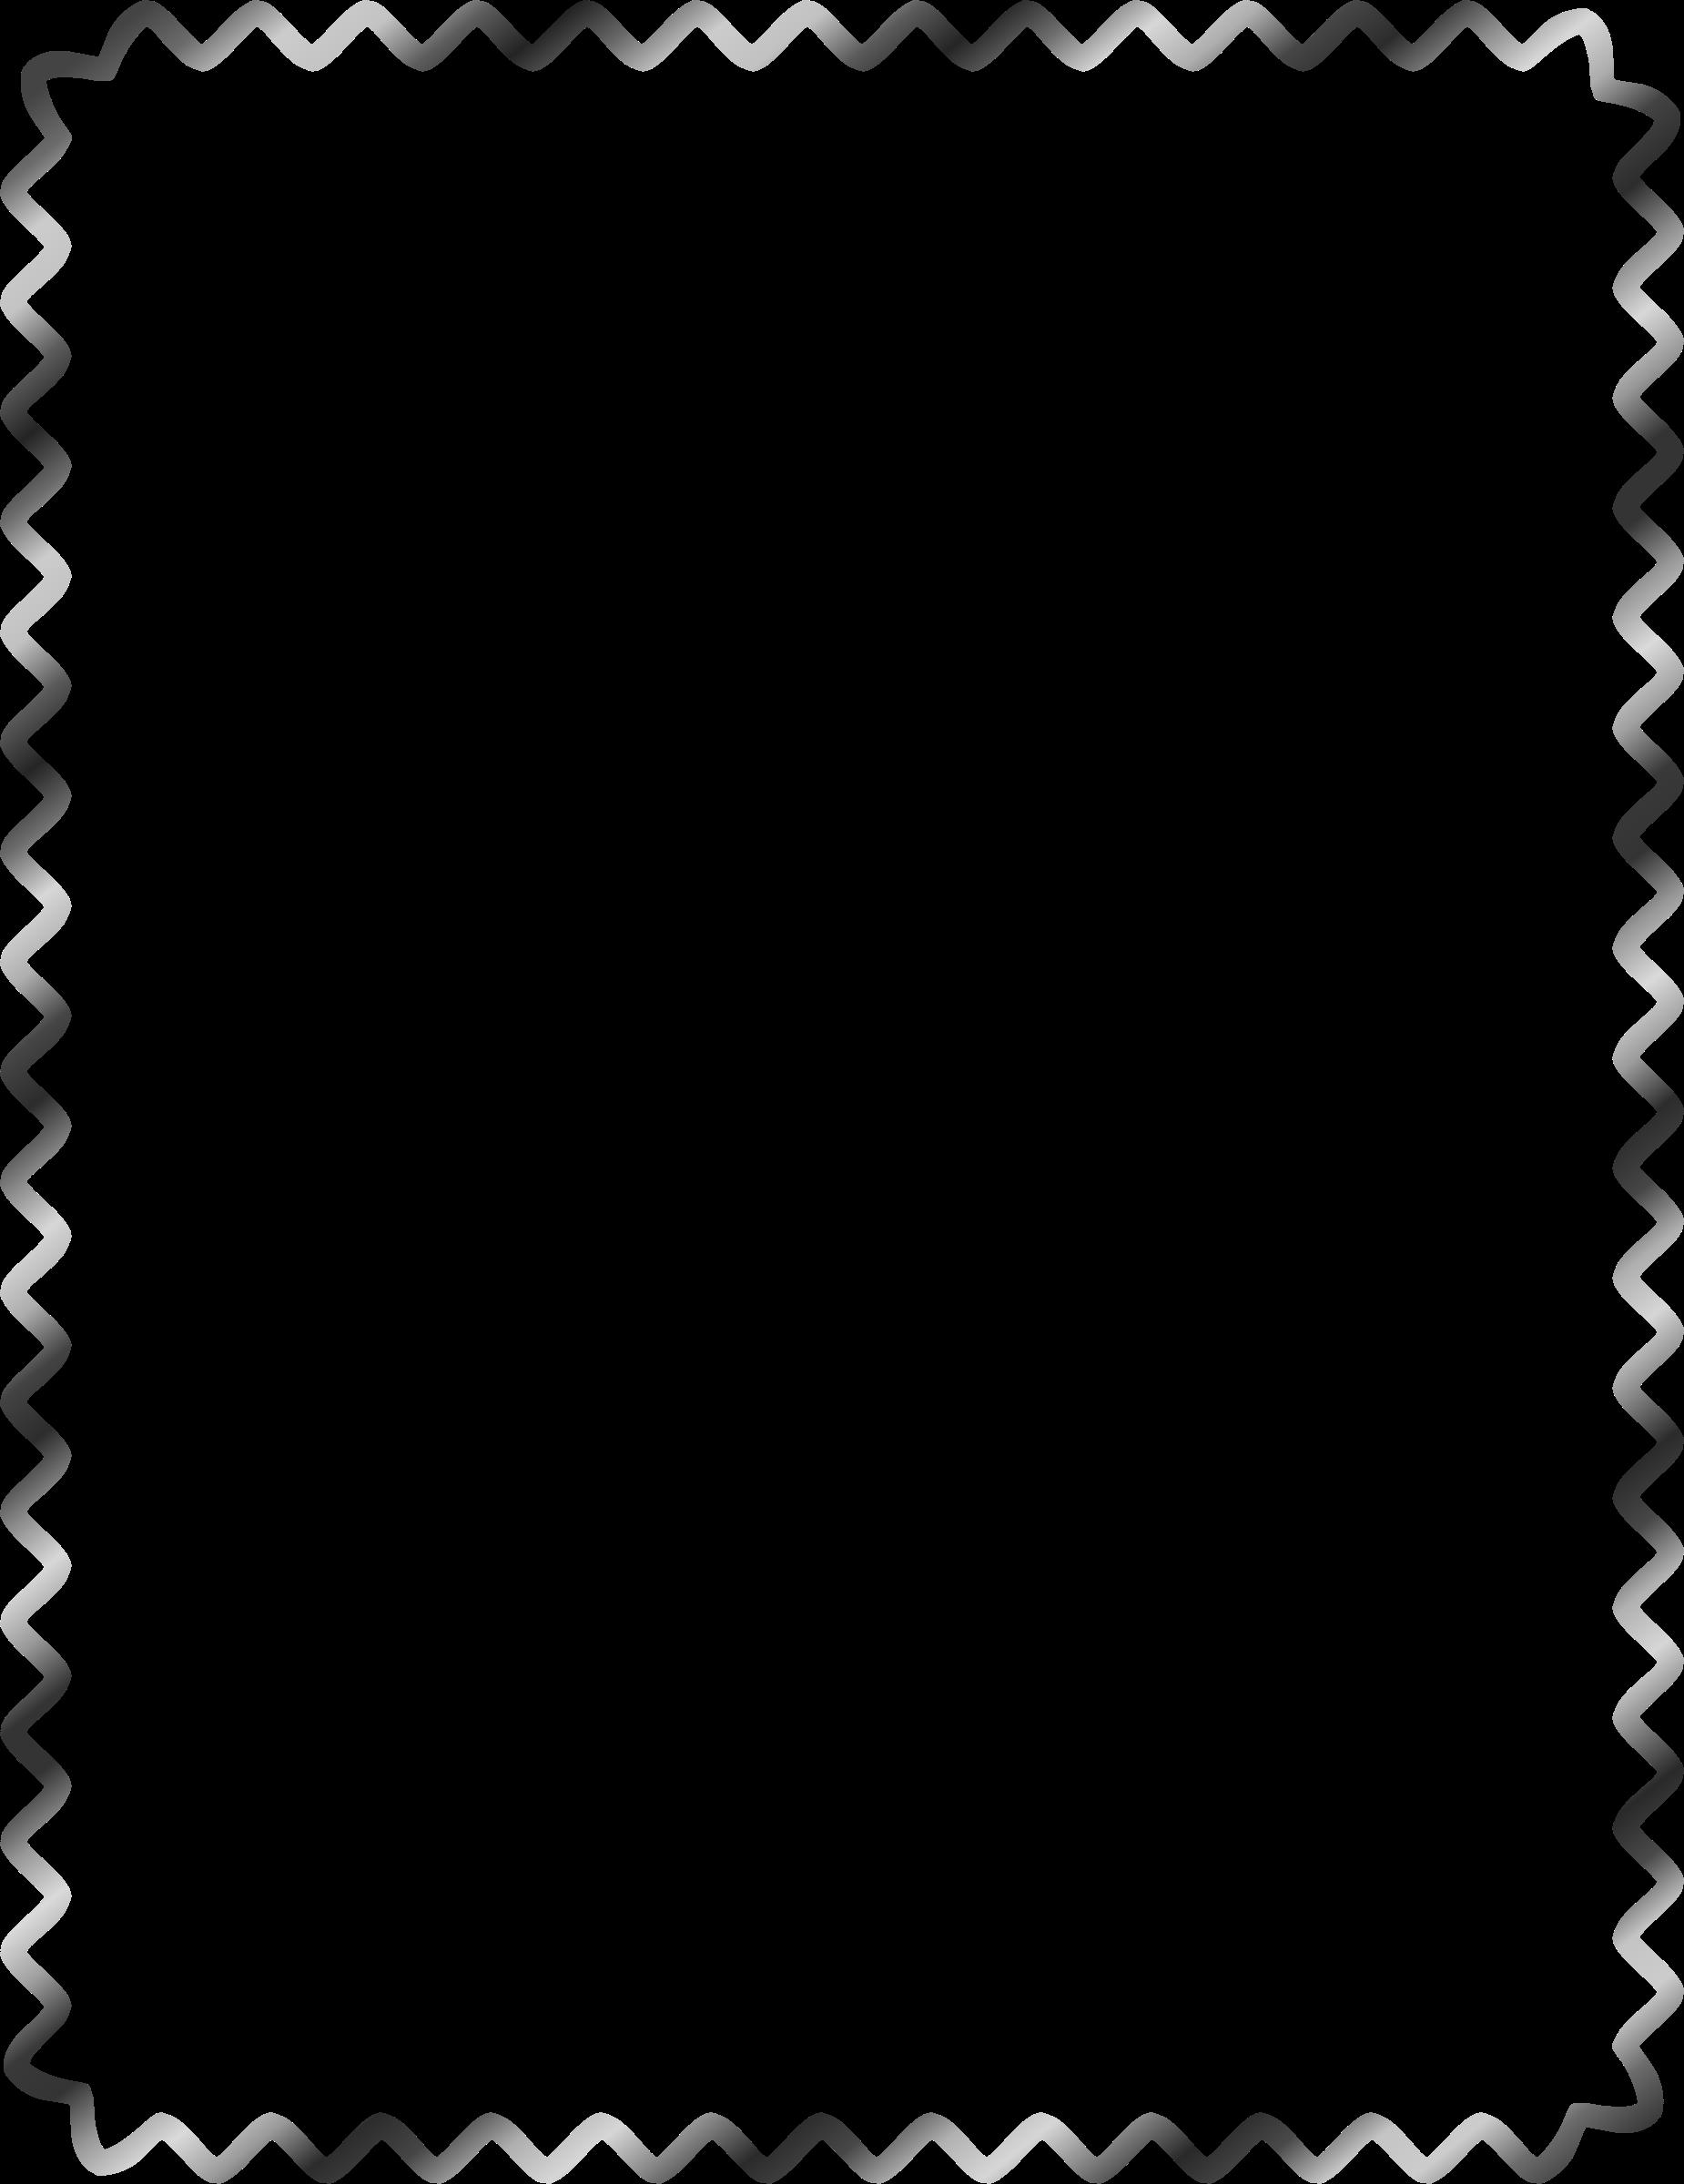 Clipart - Sine Wave Border clip art download